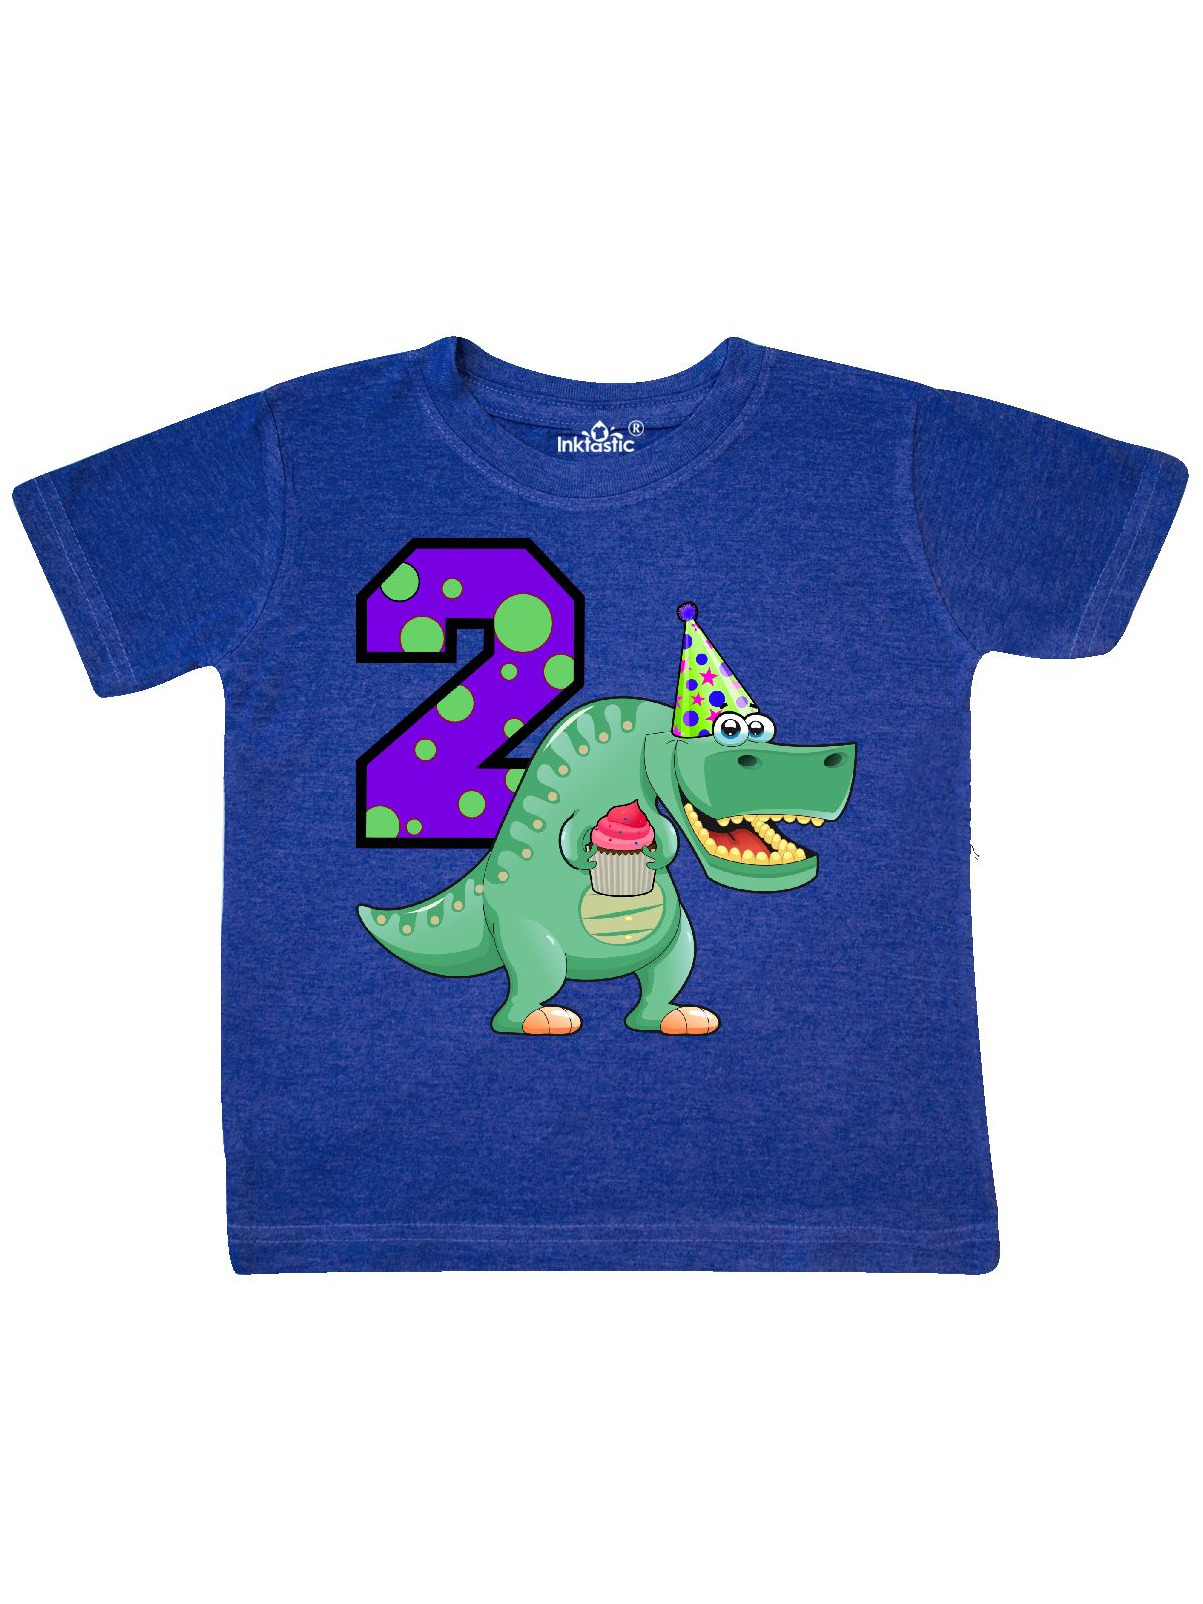 2nd Birthday T-Rex Toddler T-Shirt